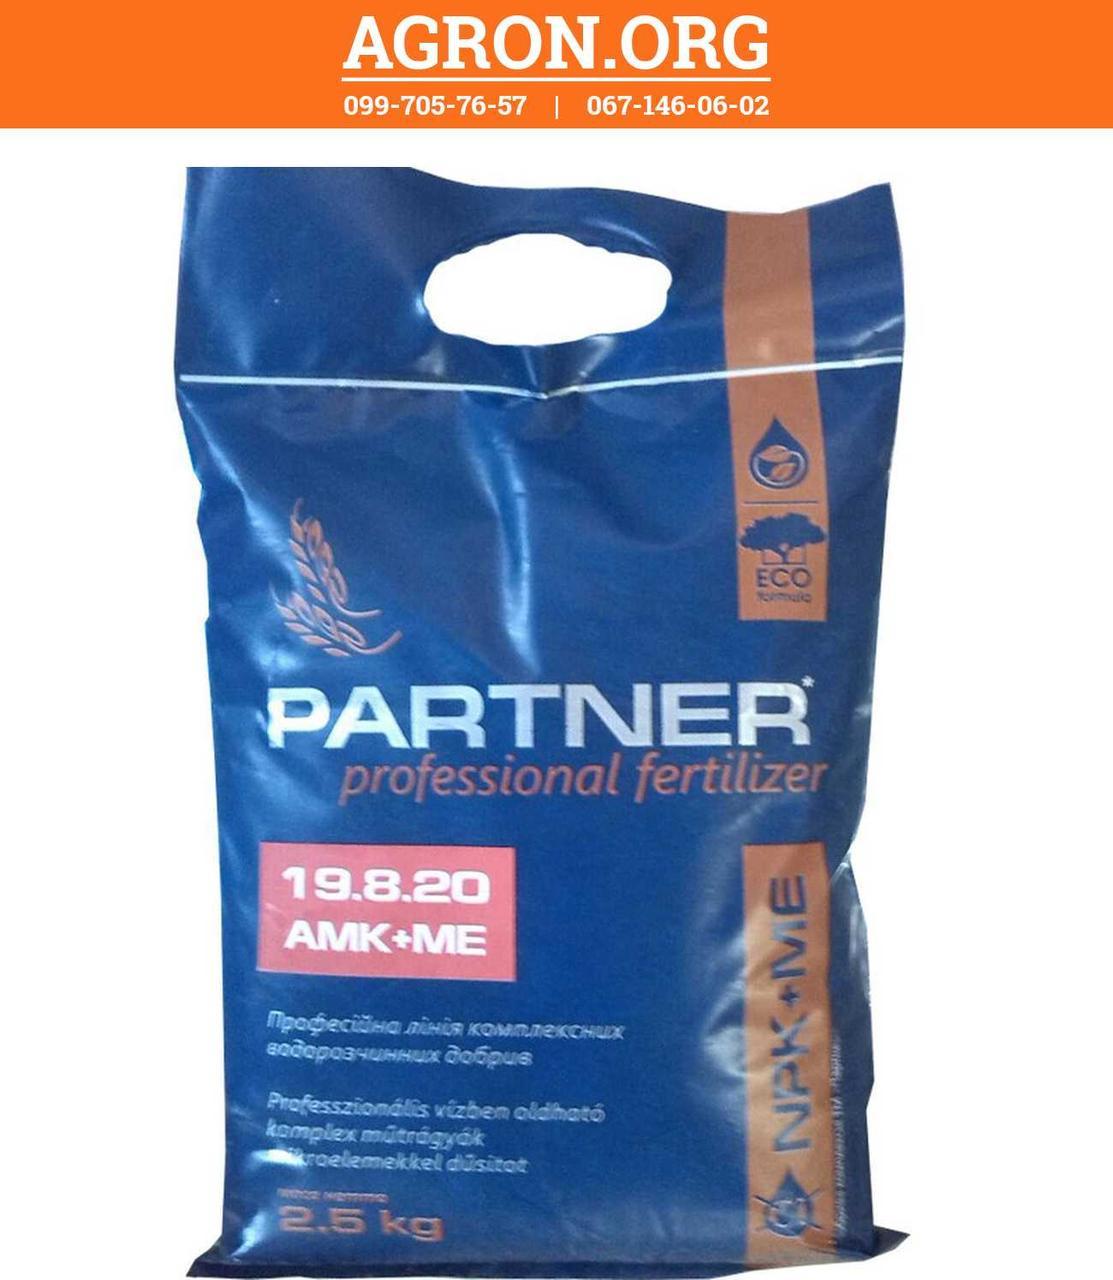 Партнер (Partner) Energy комплексне водорозчинне удобрение NPK 19.8.20+ME+АМК 2,5 кг